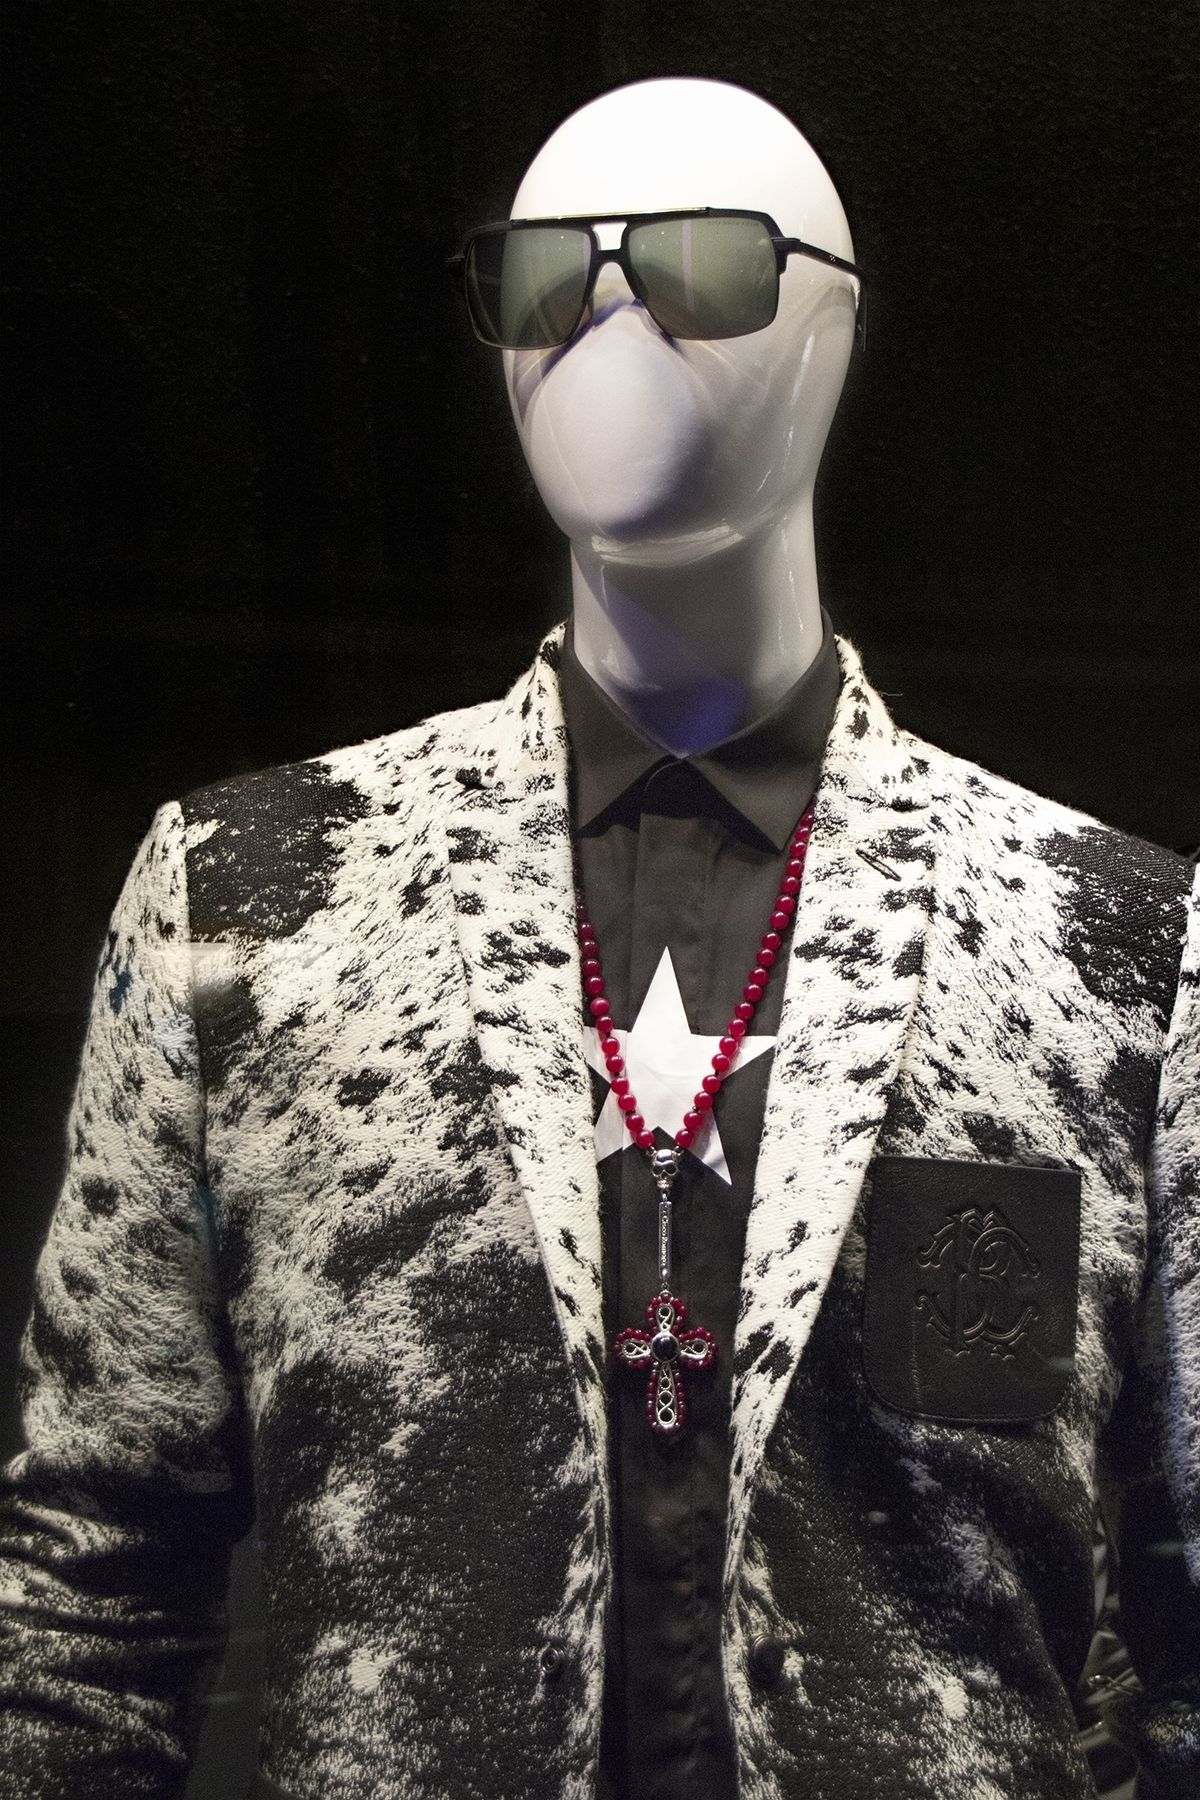 ELITE Man shop windows, zoom in: Givenchy shirt, Roberto Cavalli blazer, Dita sunnies, Cisco Romero necklace http://www.elitestore.es/men.html